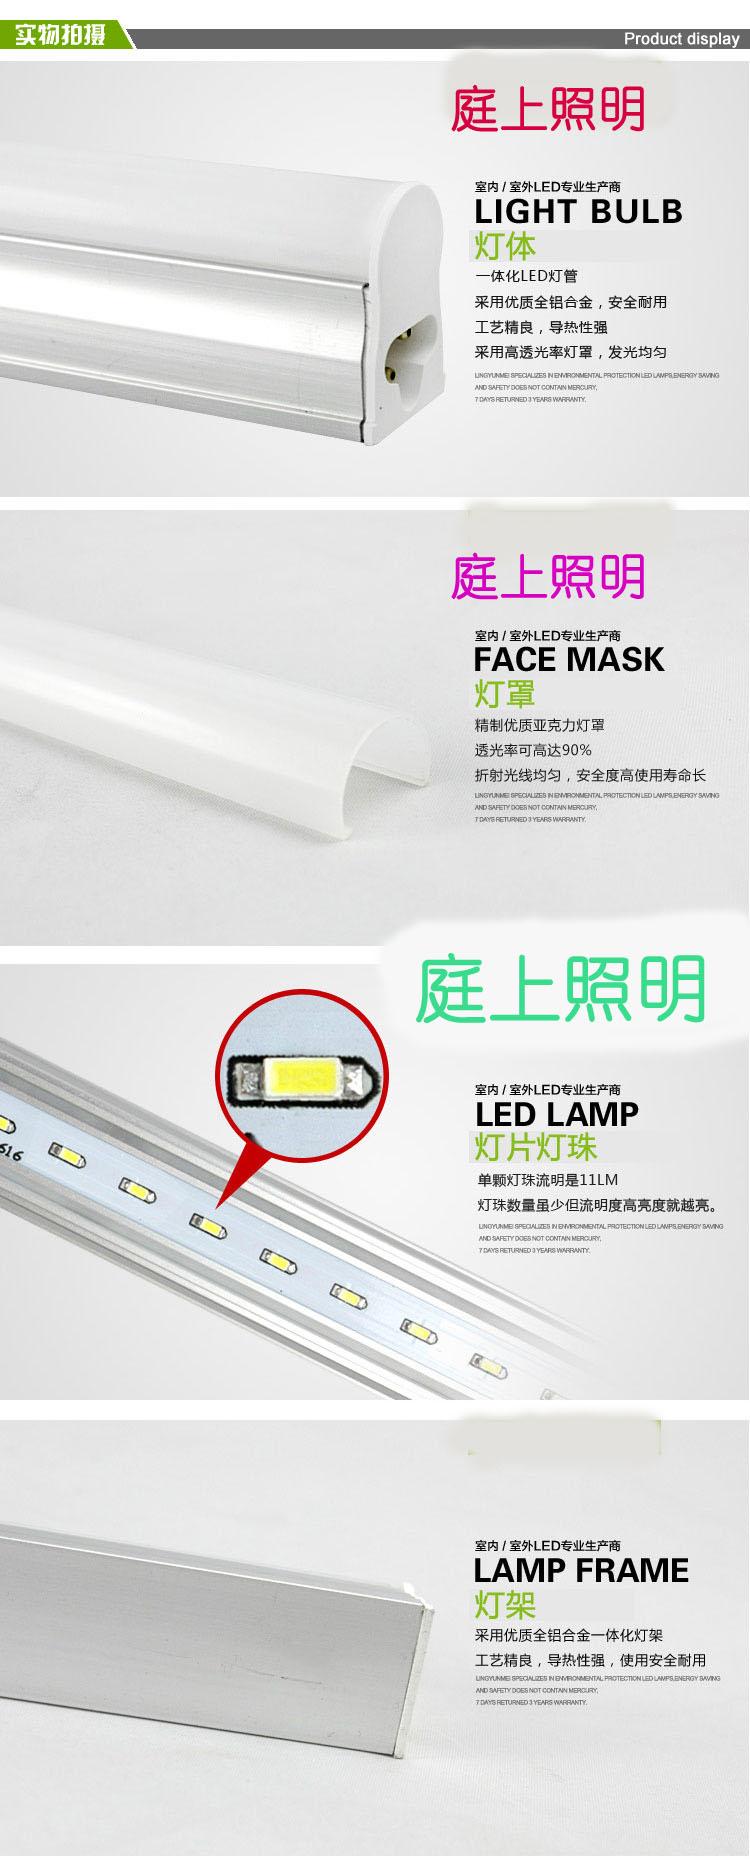 T8一体日光灯LED灯管 全套灯管 节能灯管18W图片三